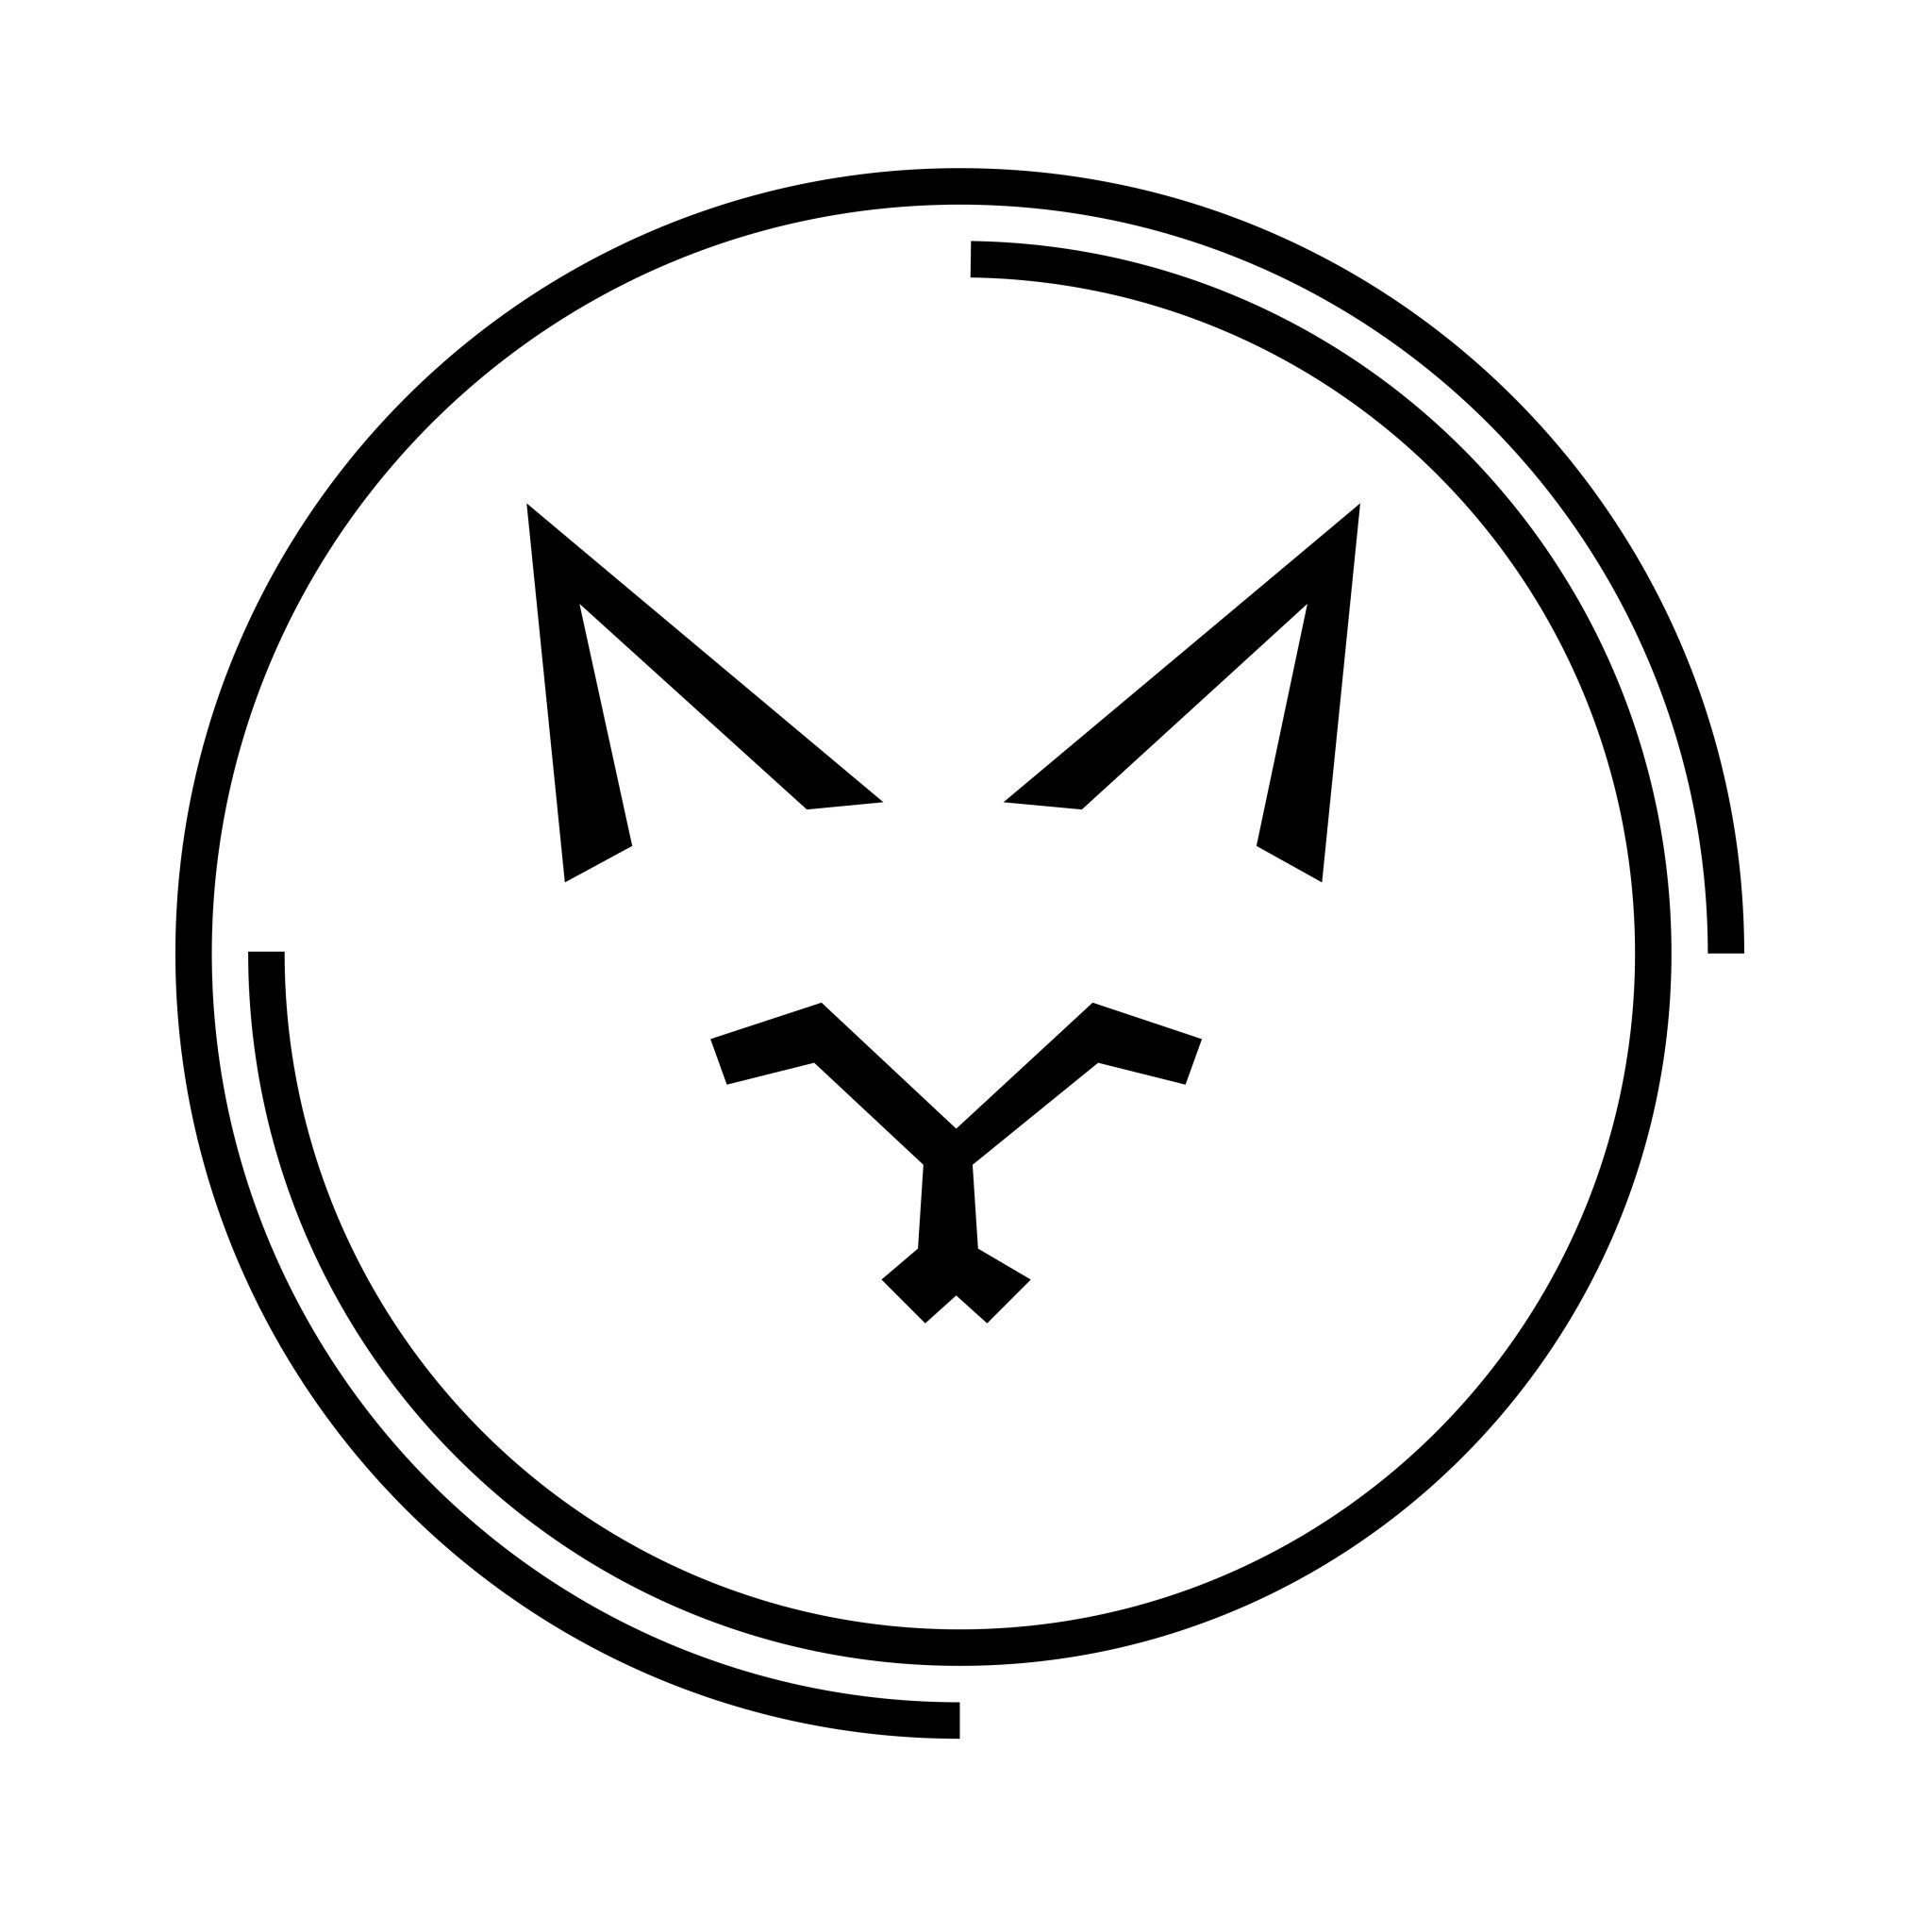 MOIN Sticker